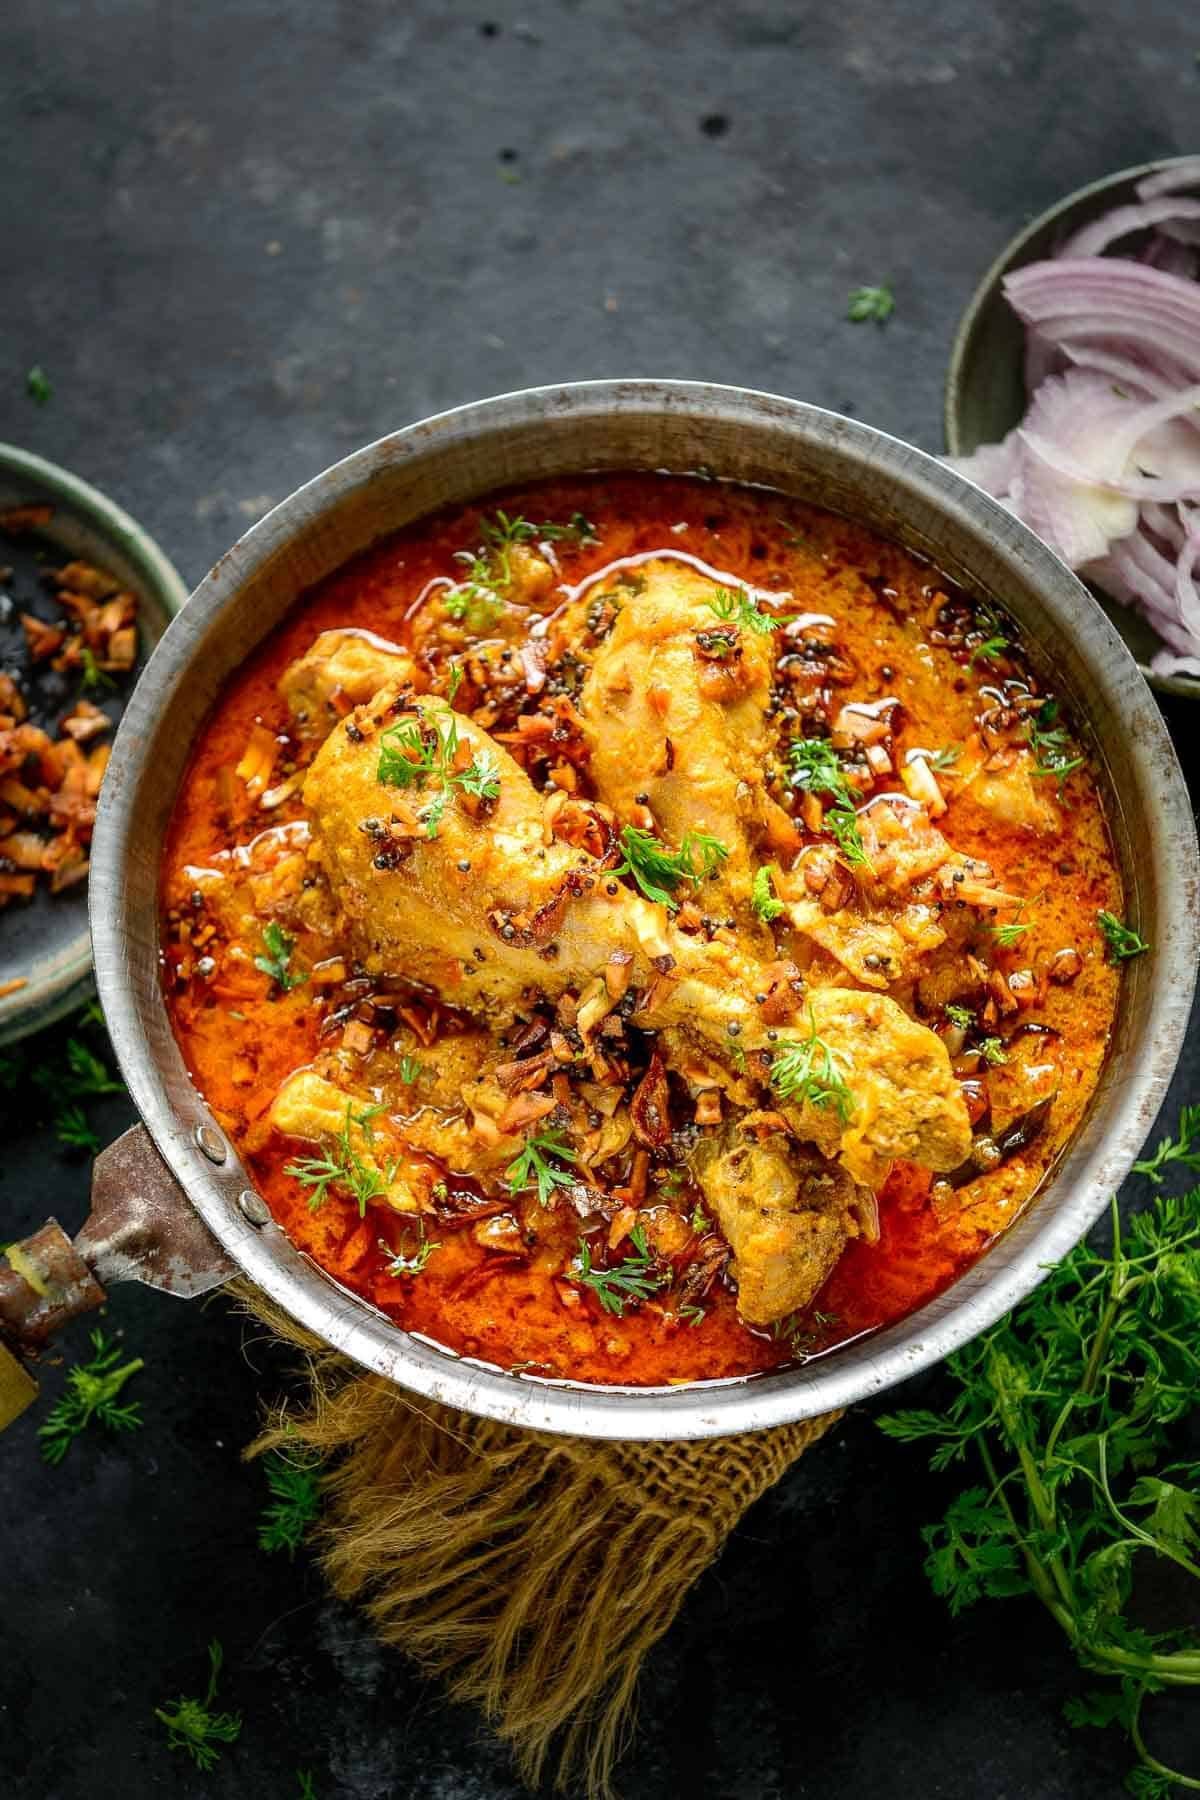 Malabar Chicken Curry served in a bowl.